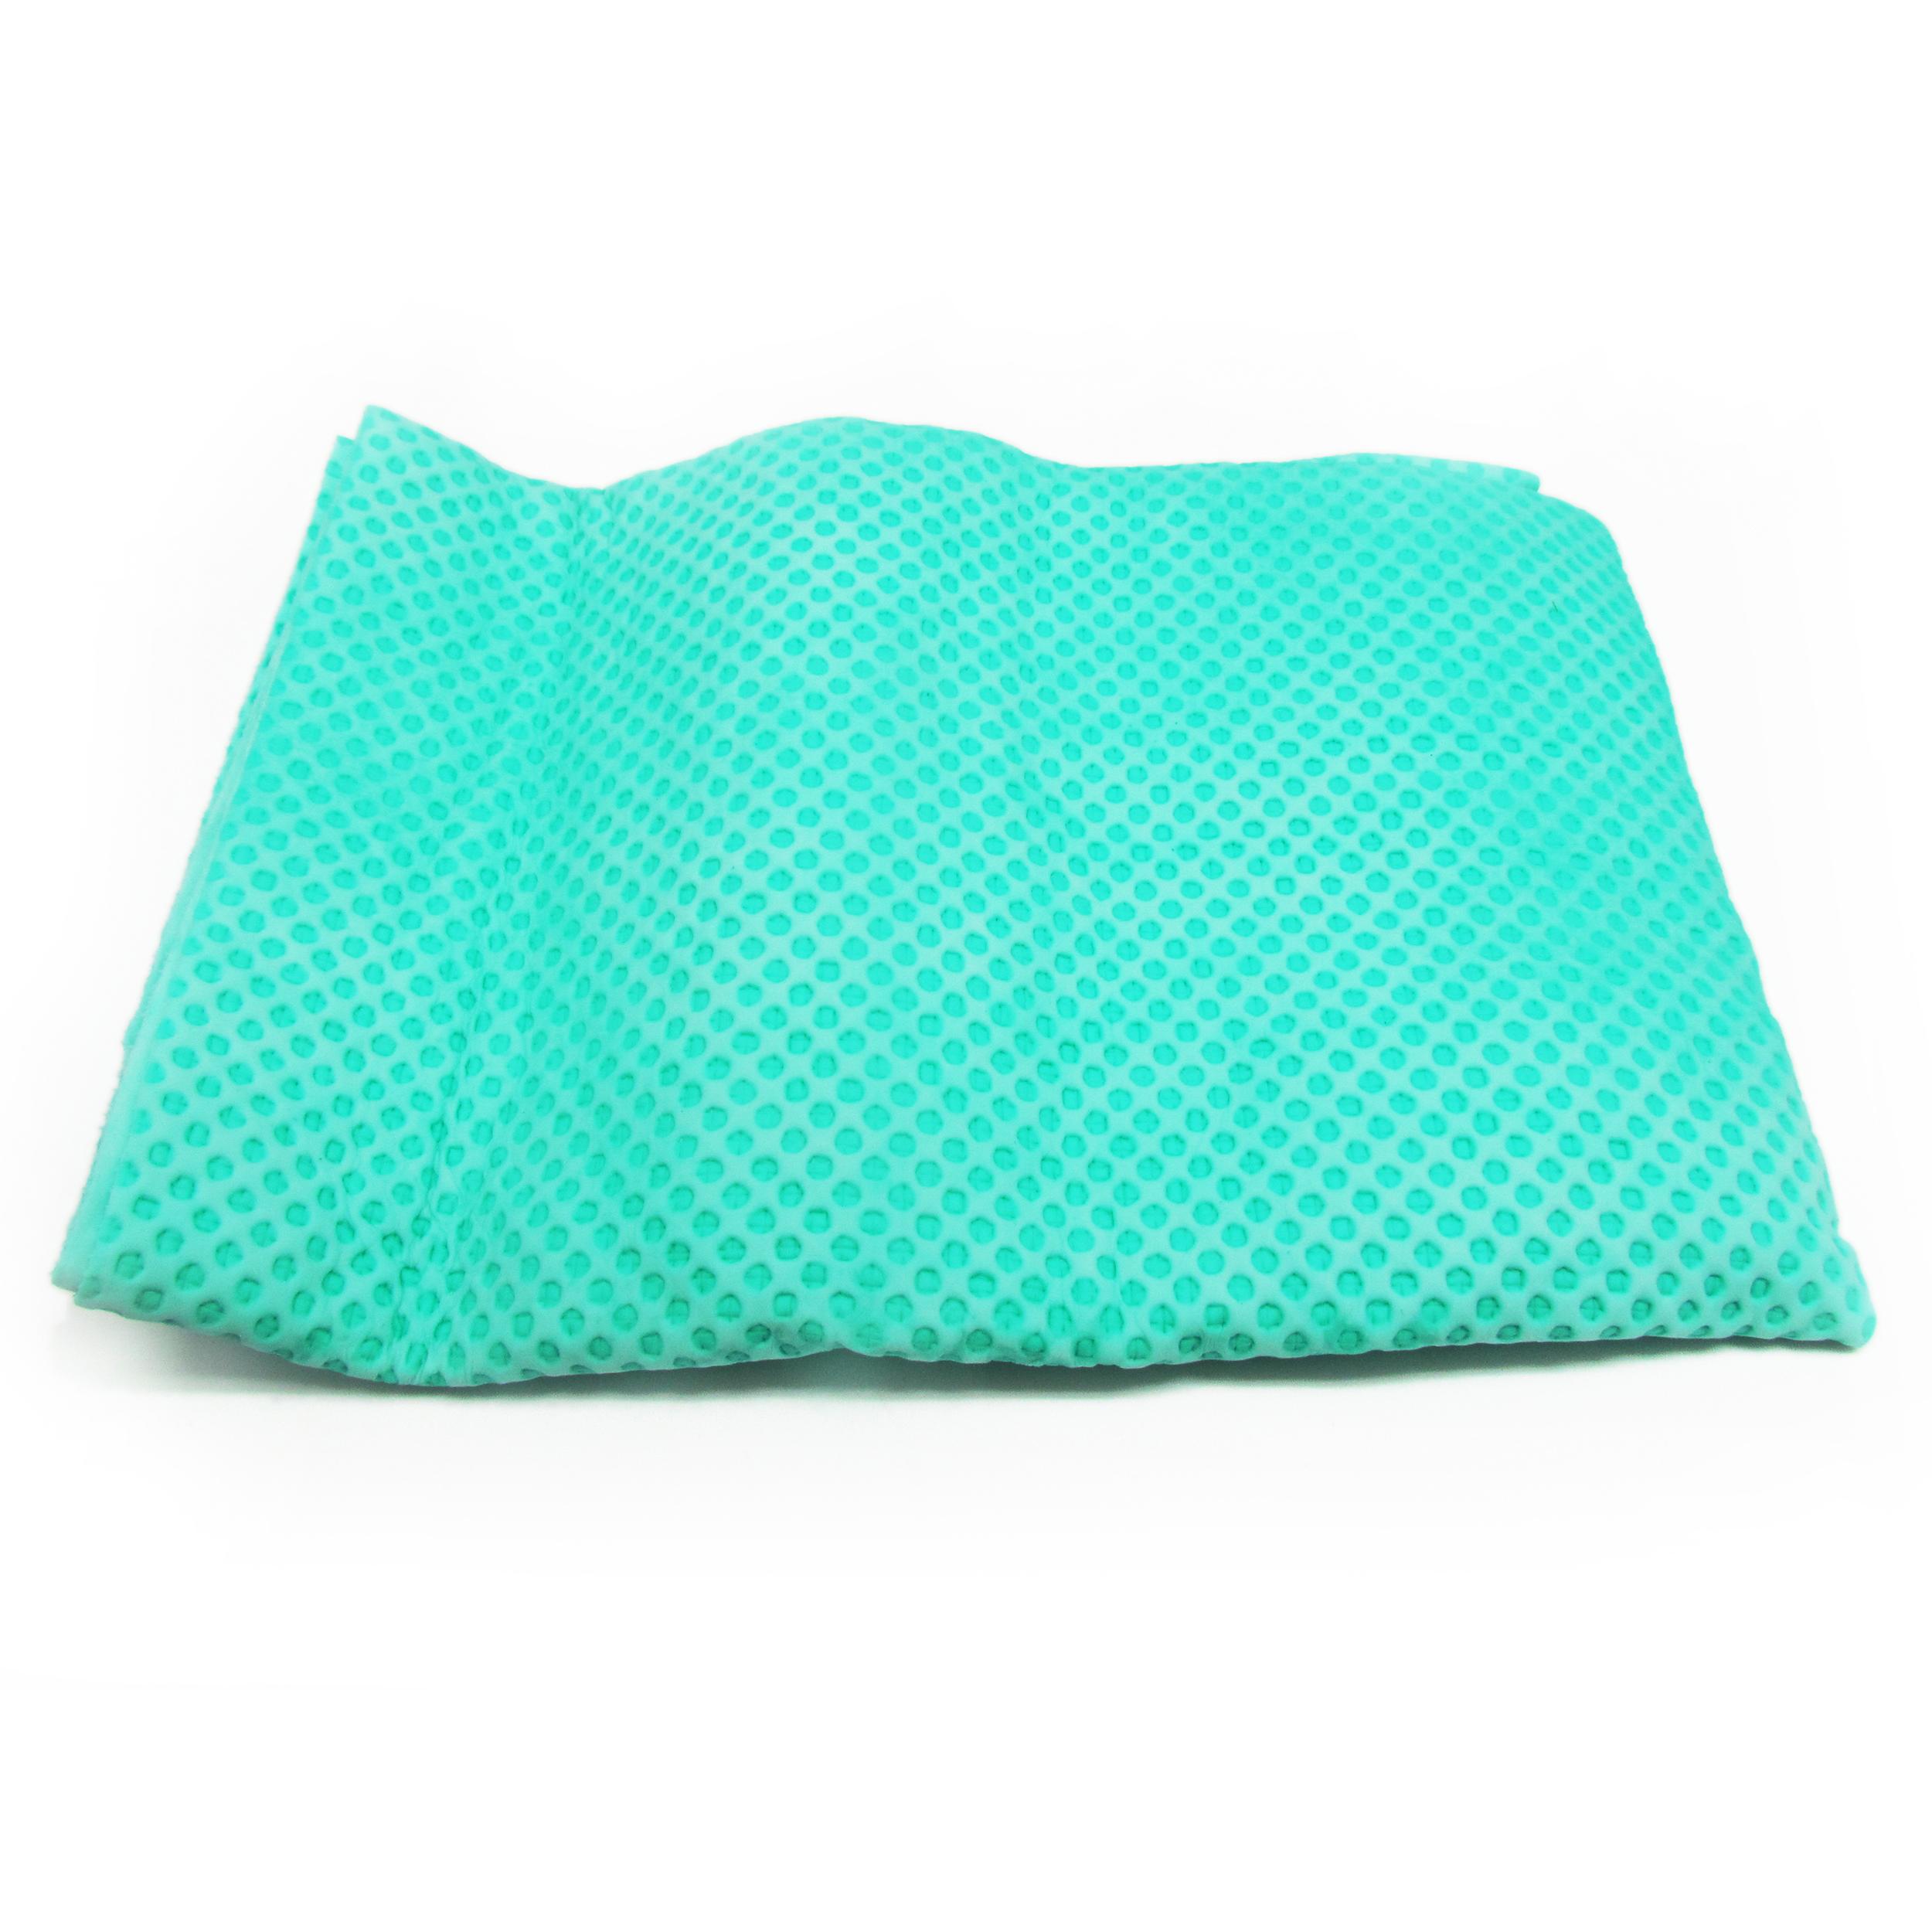 Green Cooling Towel 32